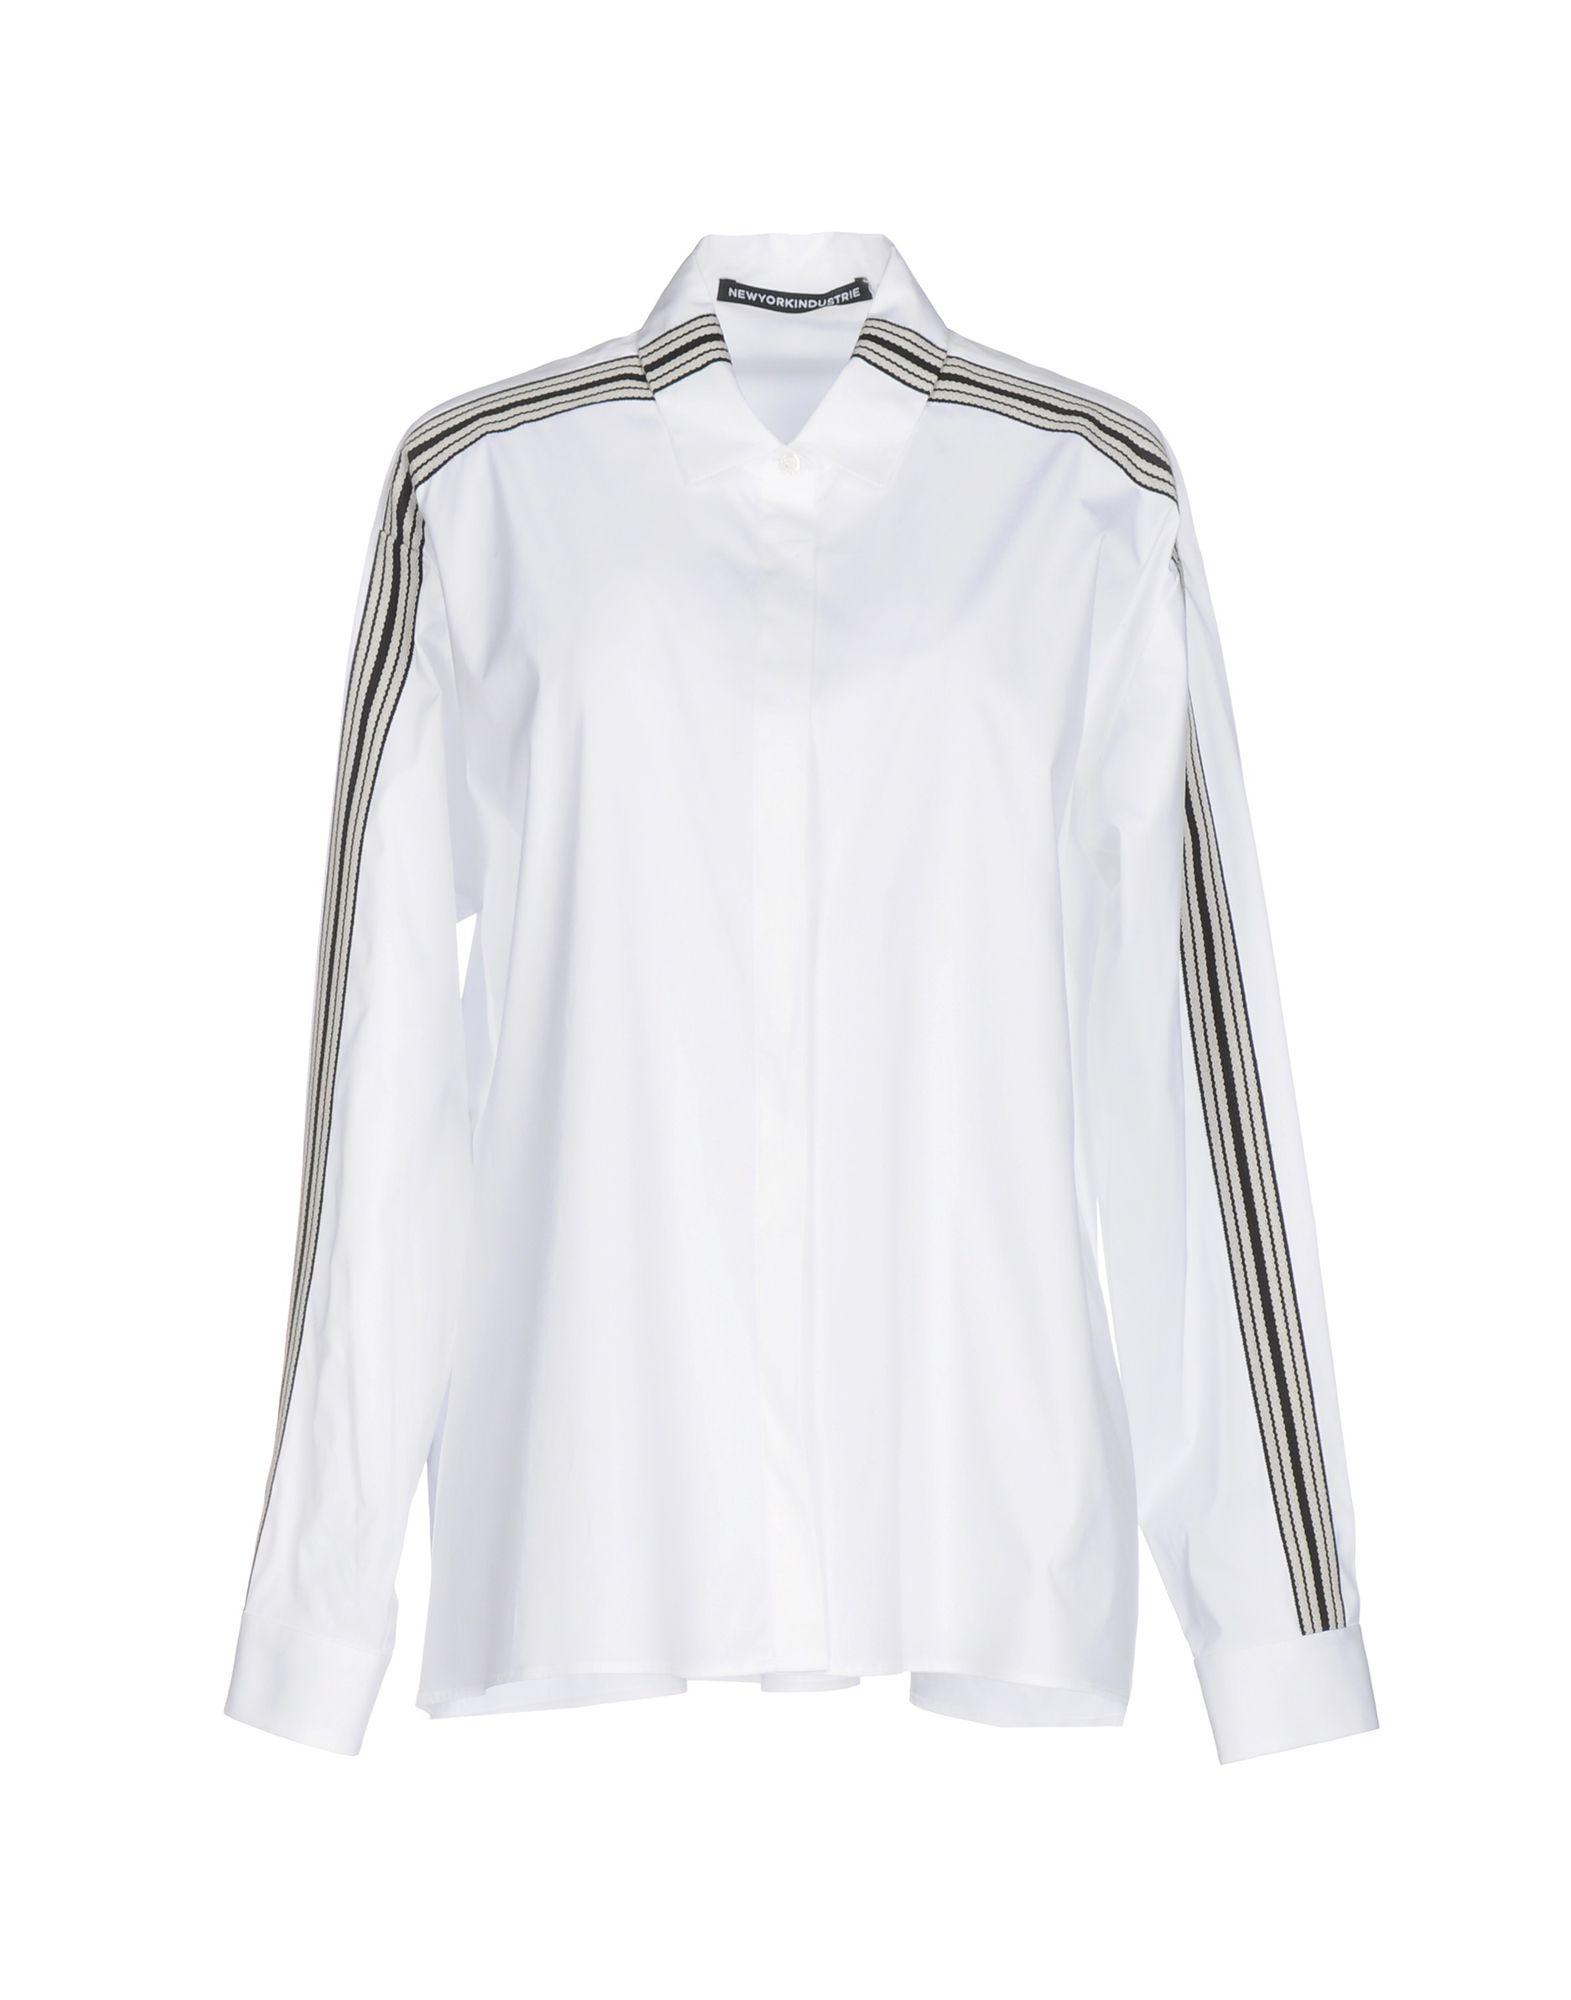 цены на NEW YORK INDUSTRIE Pубашка в интернет-магазинах